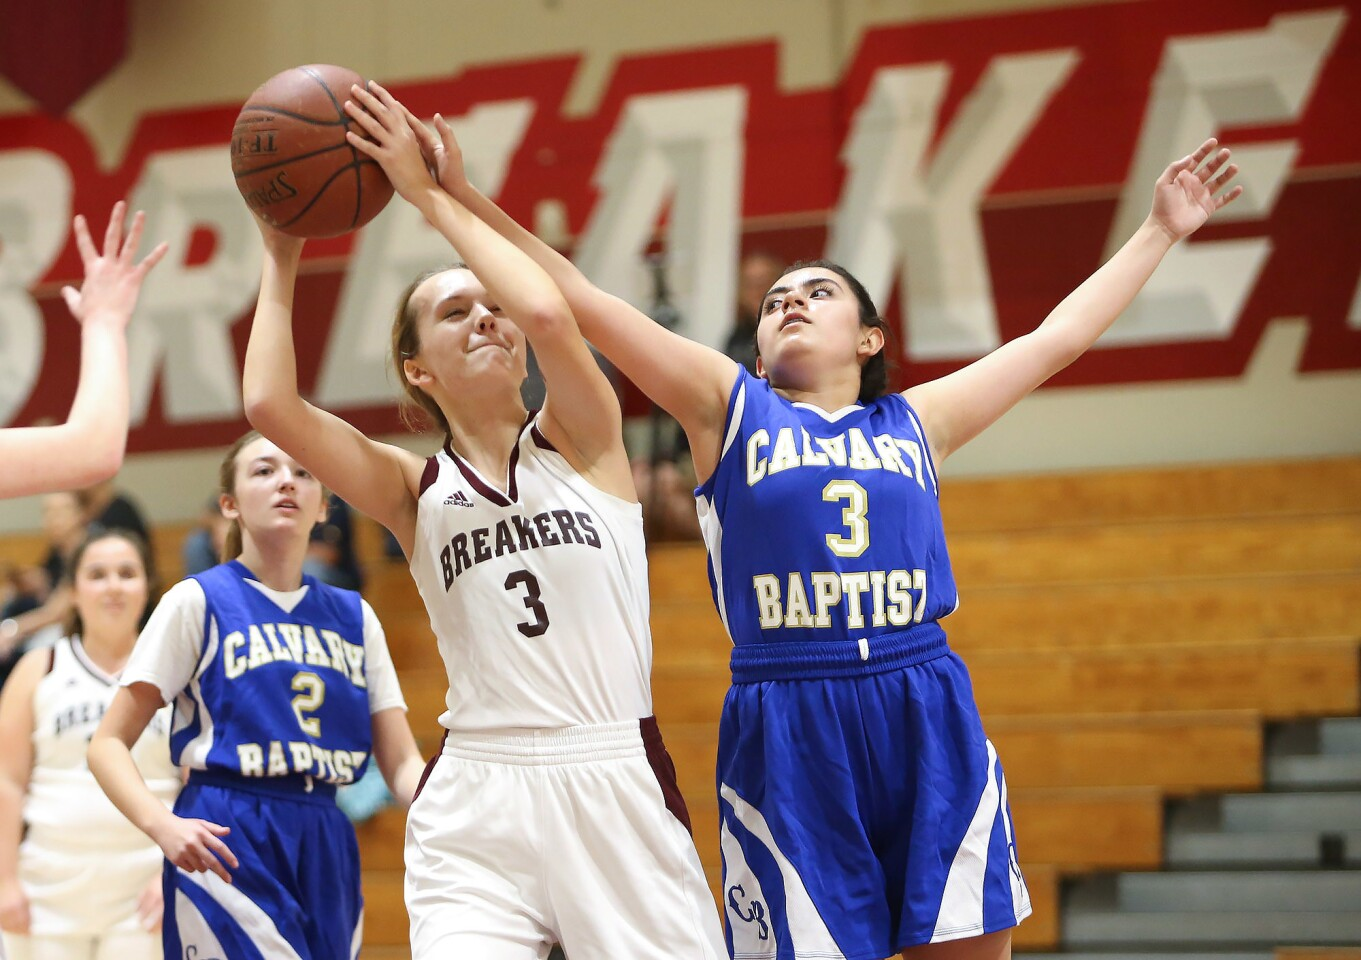 Photo Gallery: Laguna Beach vs. La Verne Calvary Baptist in girls' basketball